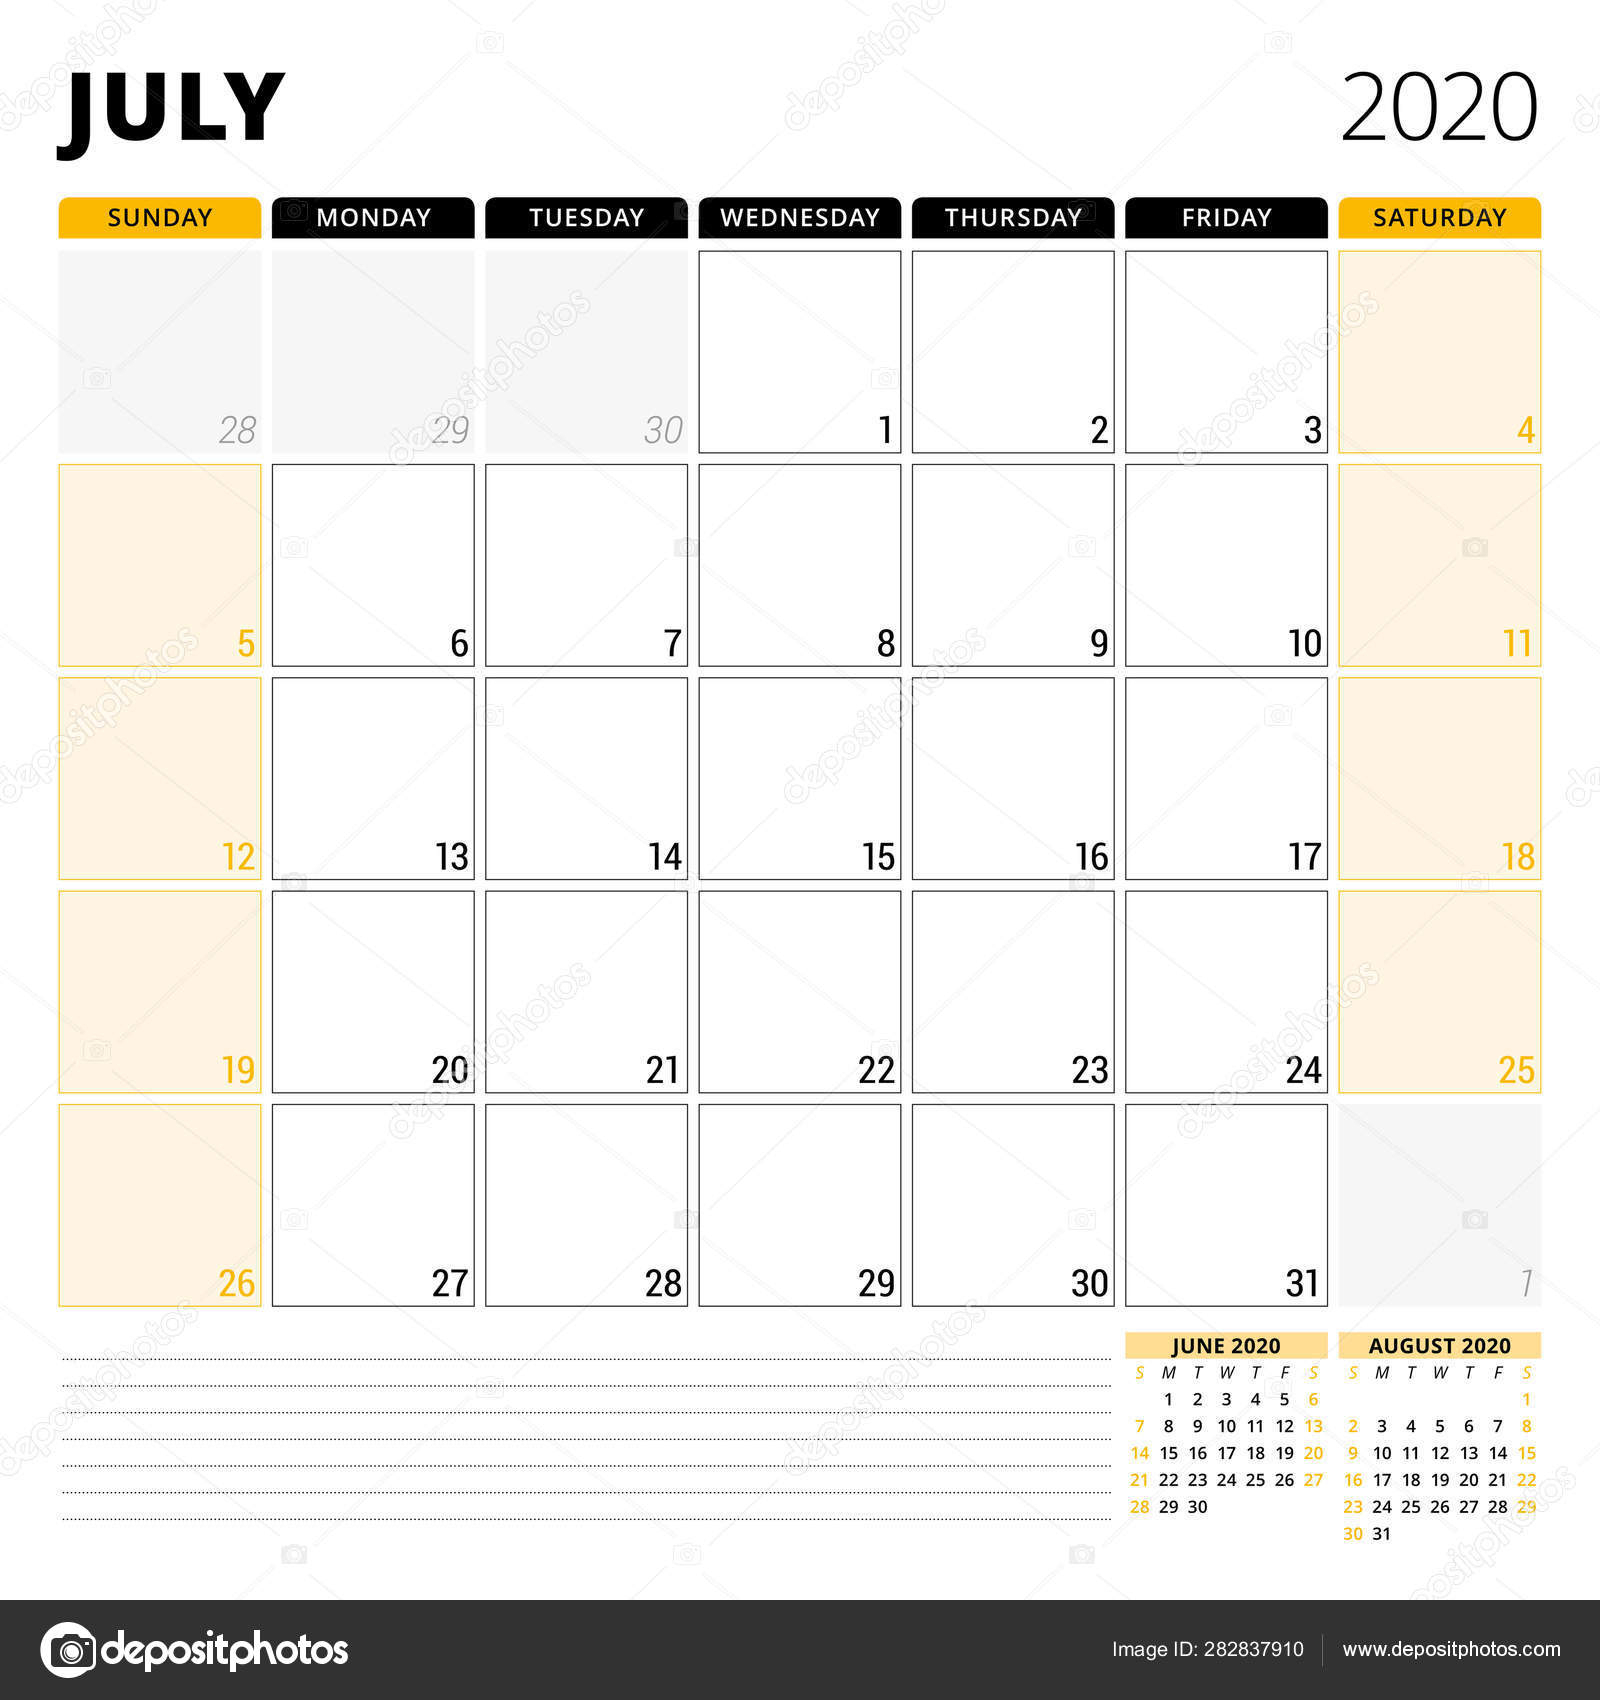 Calendar Planner For July 2020. Stationery Design Template